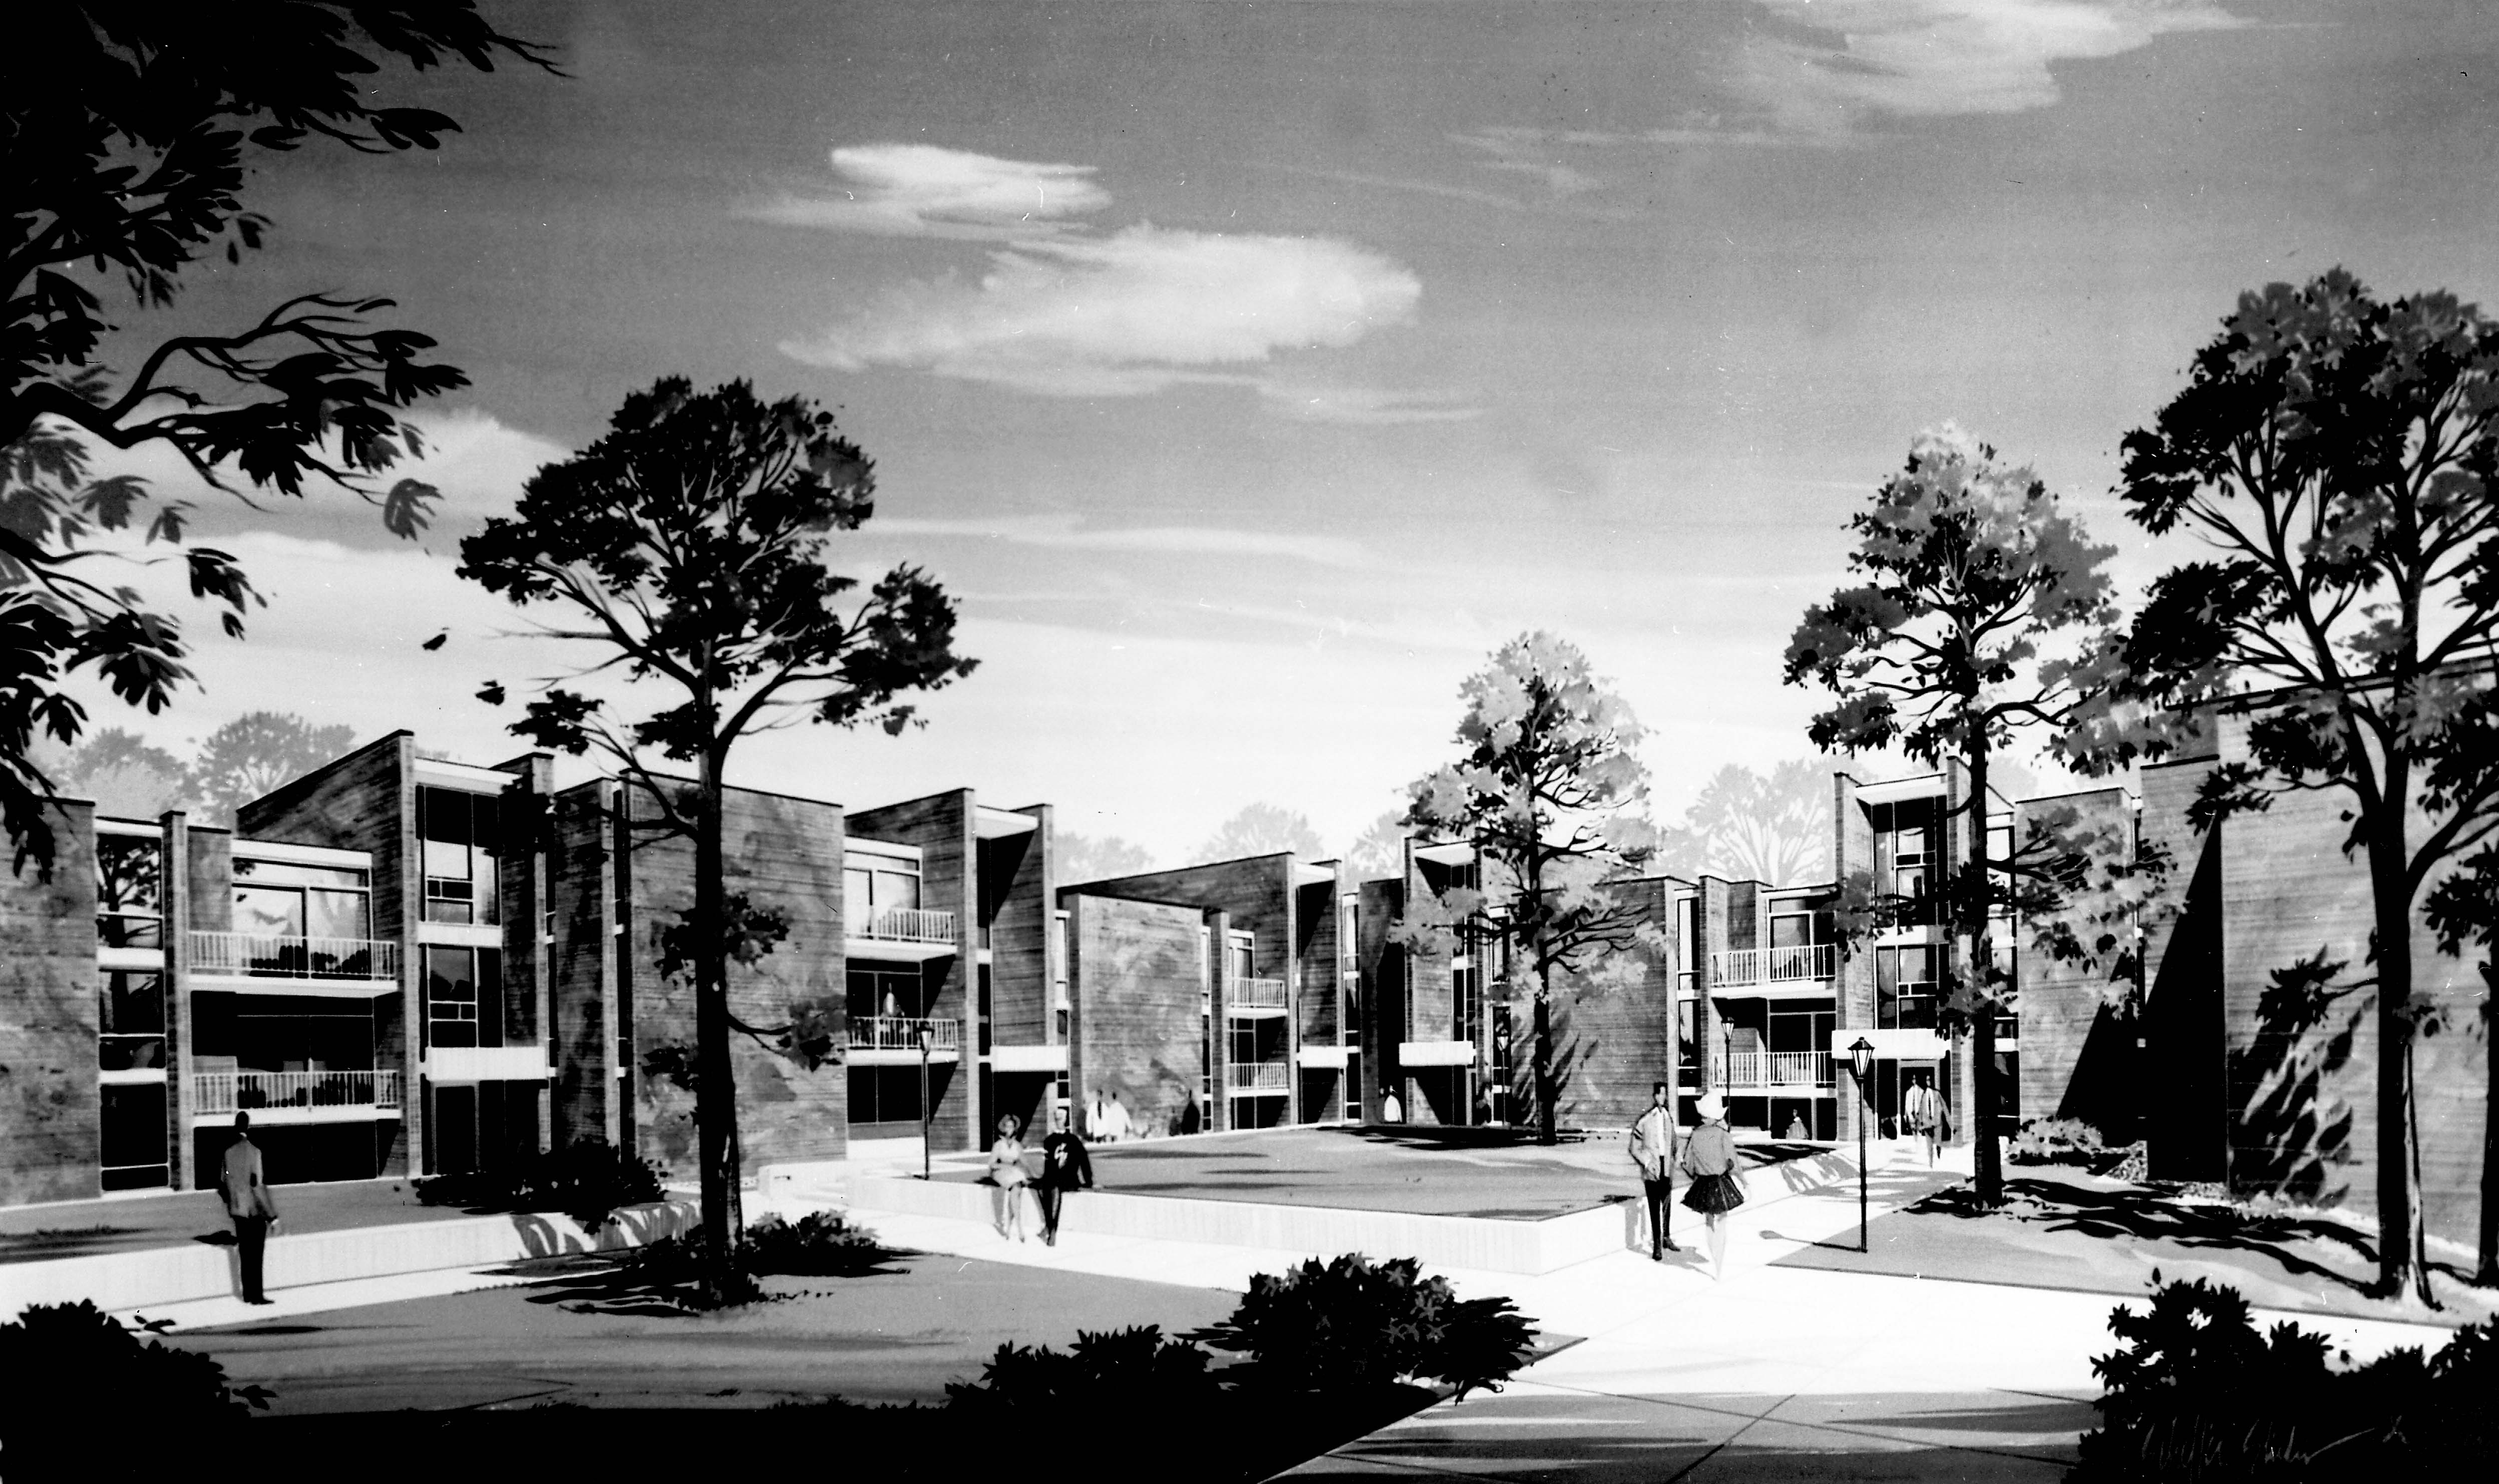 Architect's rendering of Benton Hall